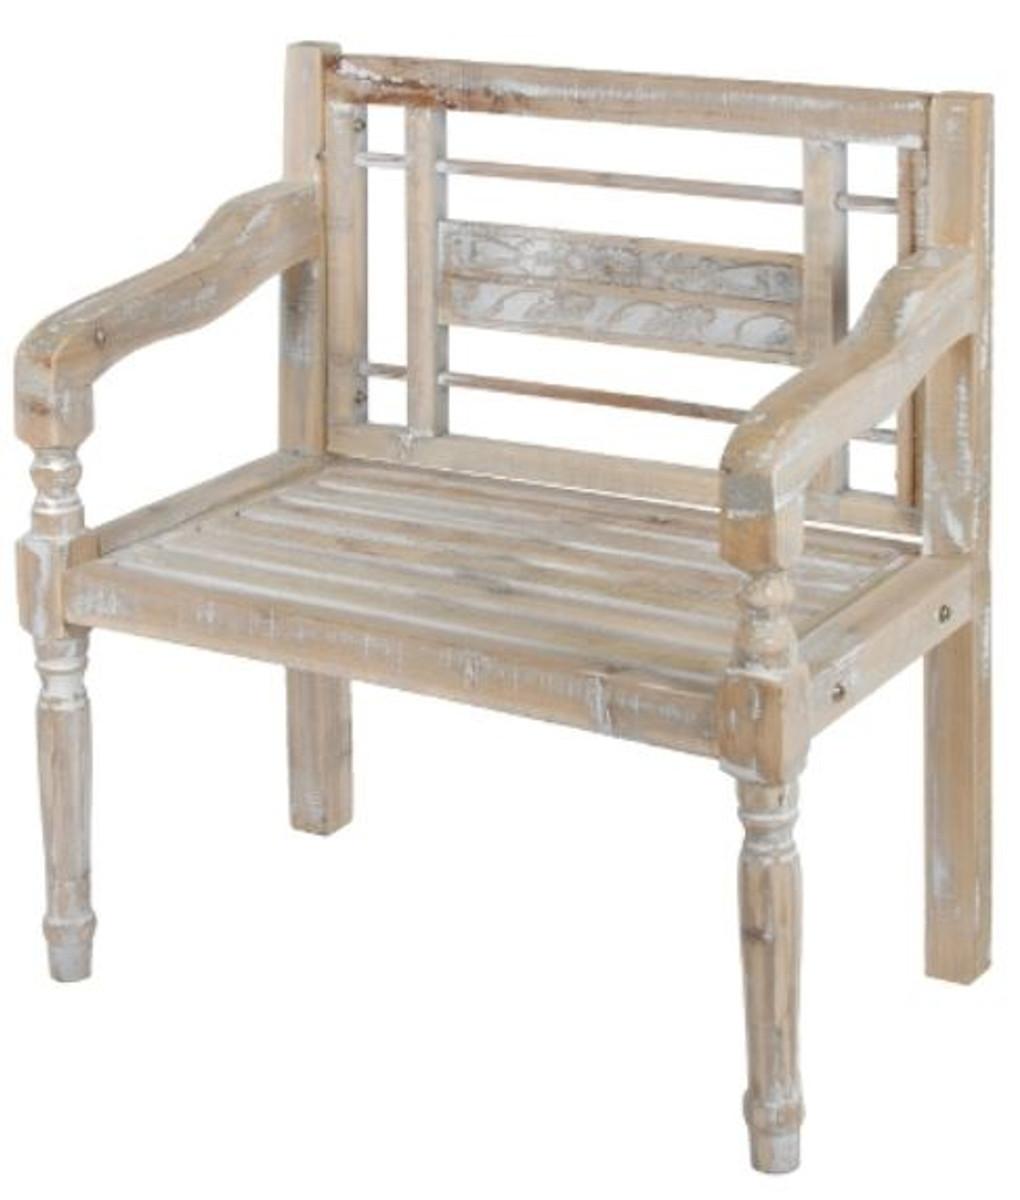 casa padrino landhausstil sitzbank mit armlehnen antik. Black Bedroom Furniture Sets. Home Design Ideas